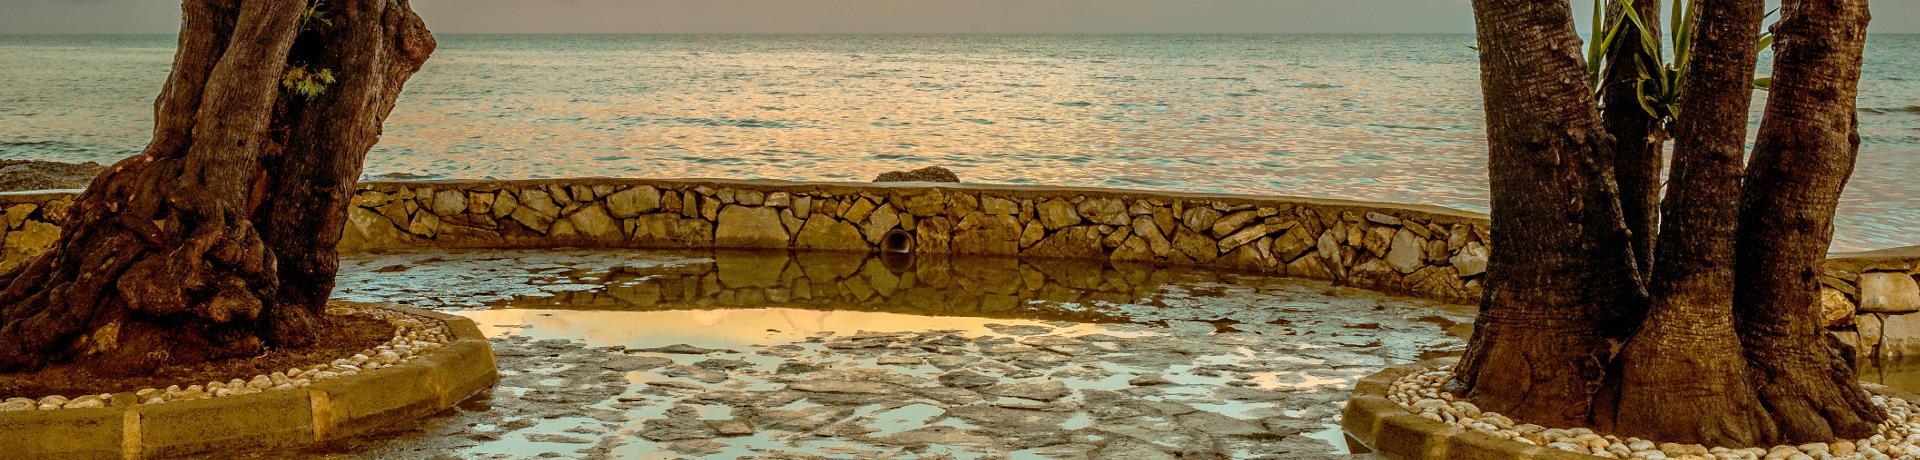 Mallorca bei Regen Emotion